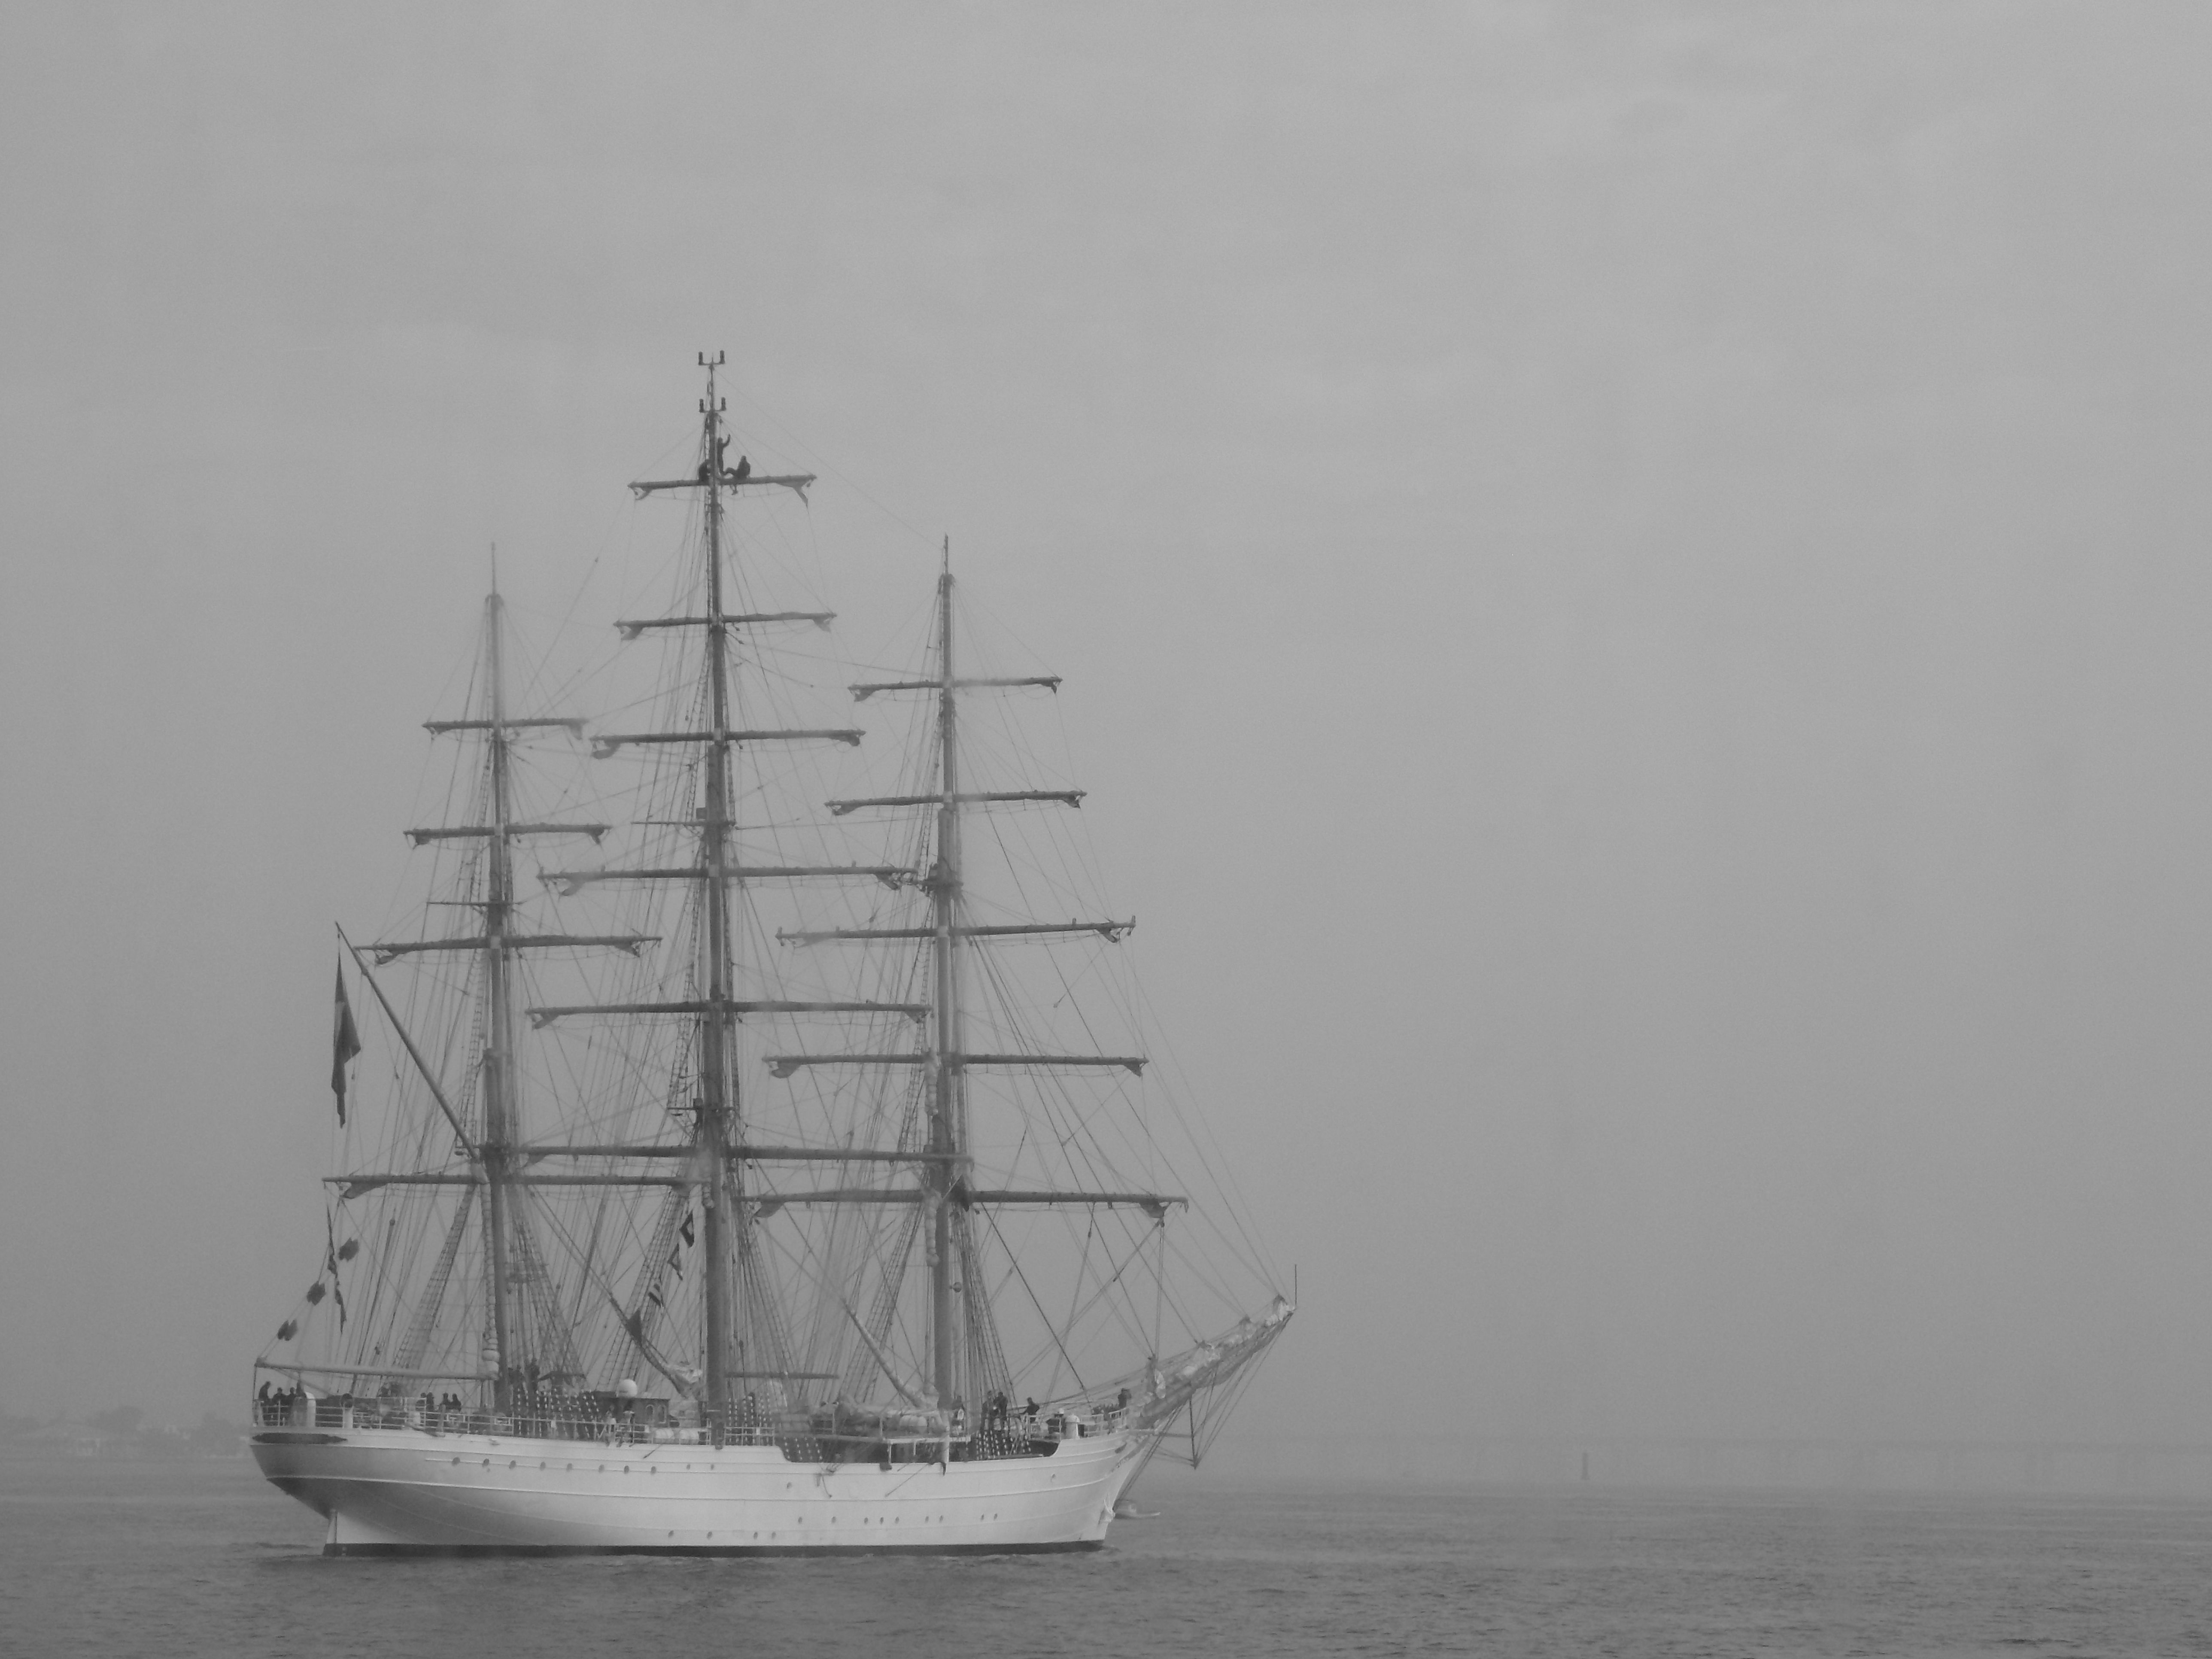 Navio Veleiro da Marinha do Brasil.